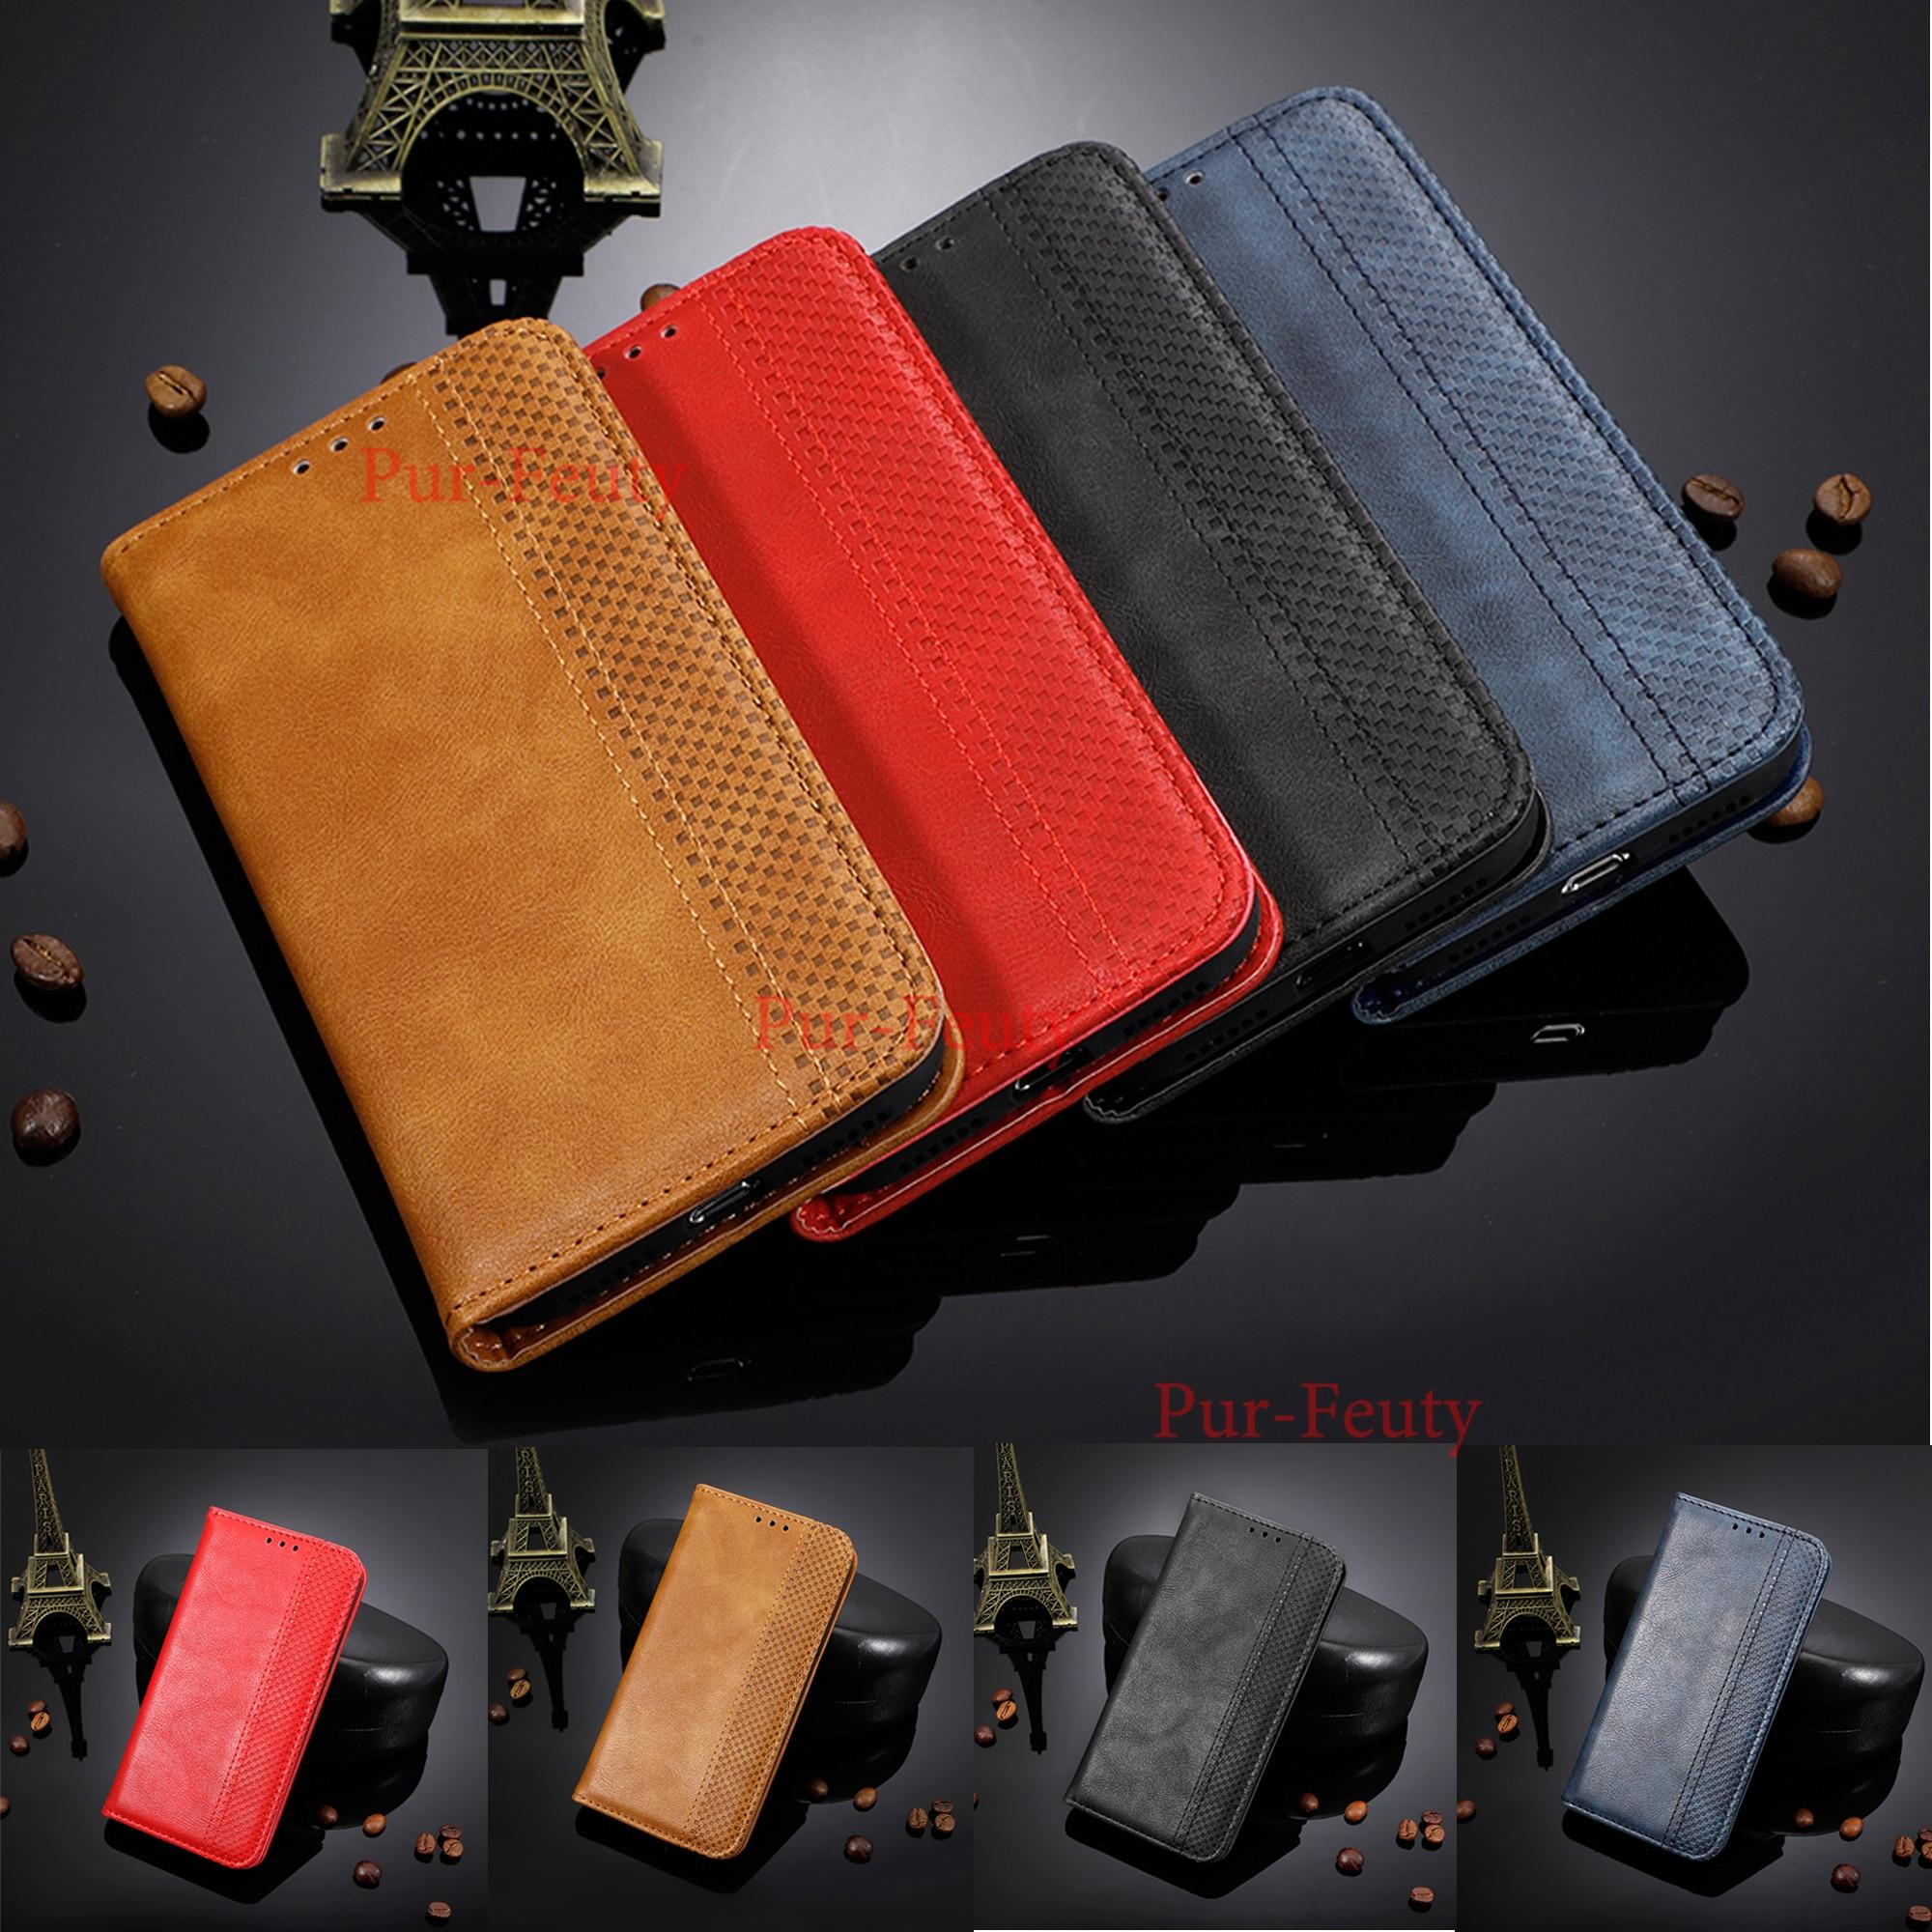 for Xiaomi Mi A3 Cover Flip PU Leather Wallet phone Case for xiaomi a 3 3a Mi 9 Lite CC9E 9 e CC9 cc 9 fashion shockproof cases